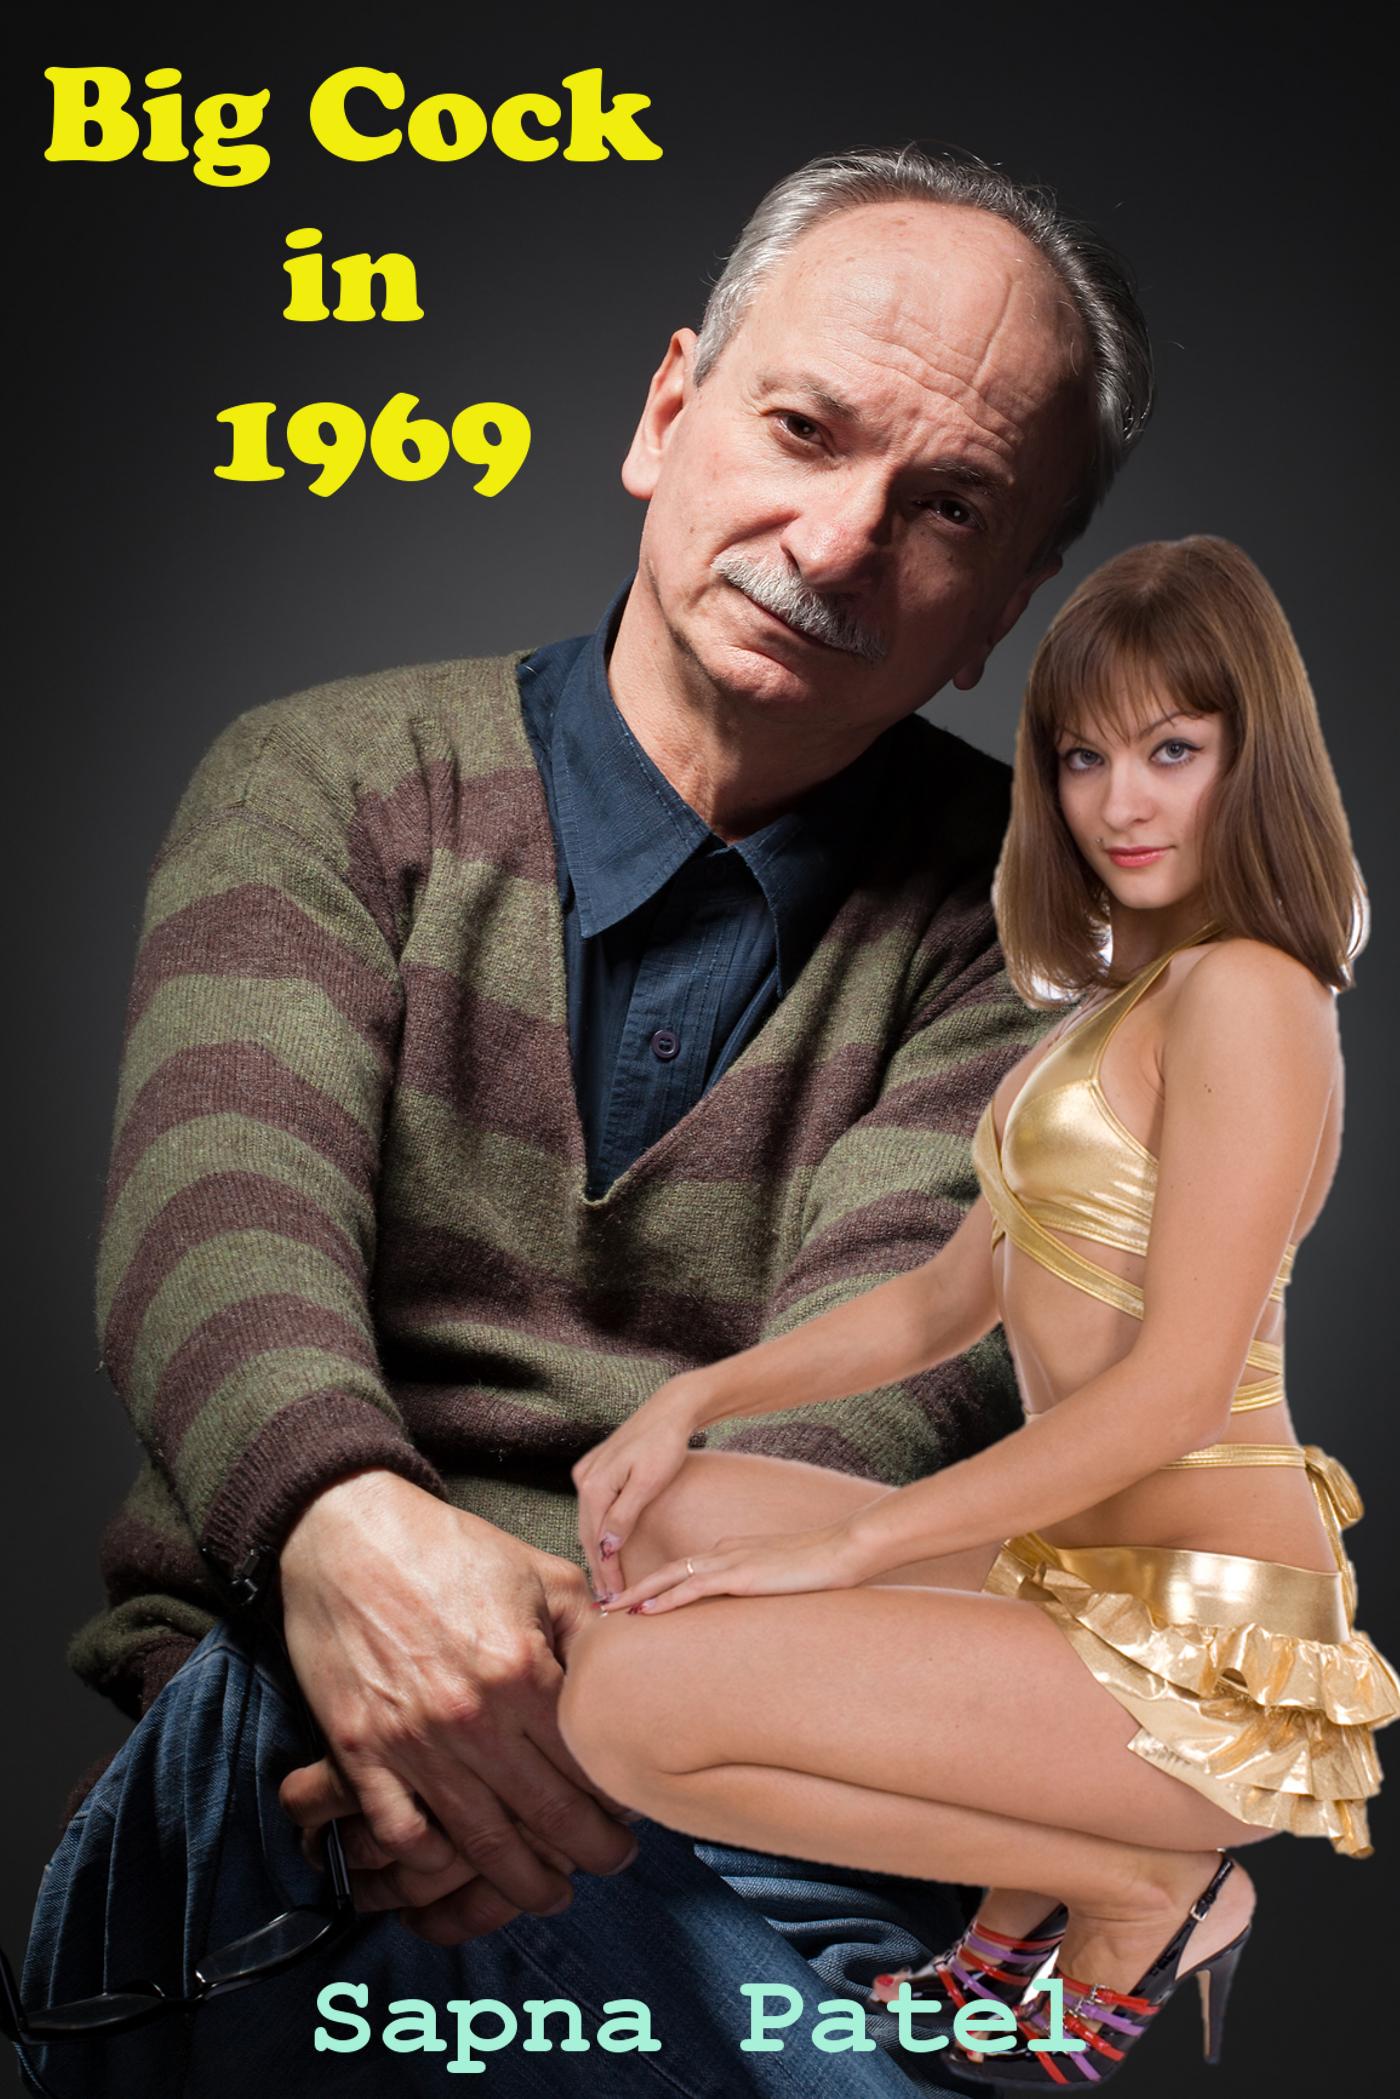 Free hardcore twink movie